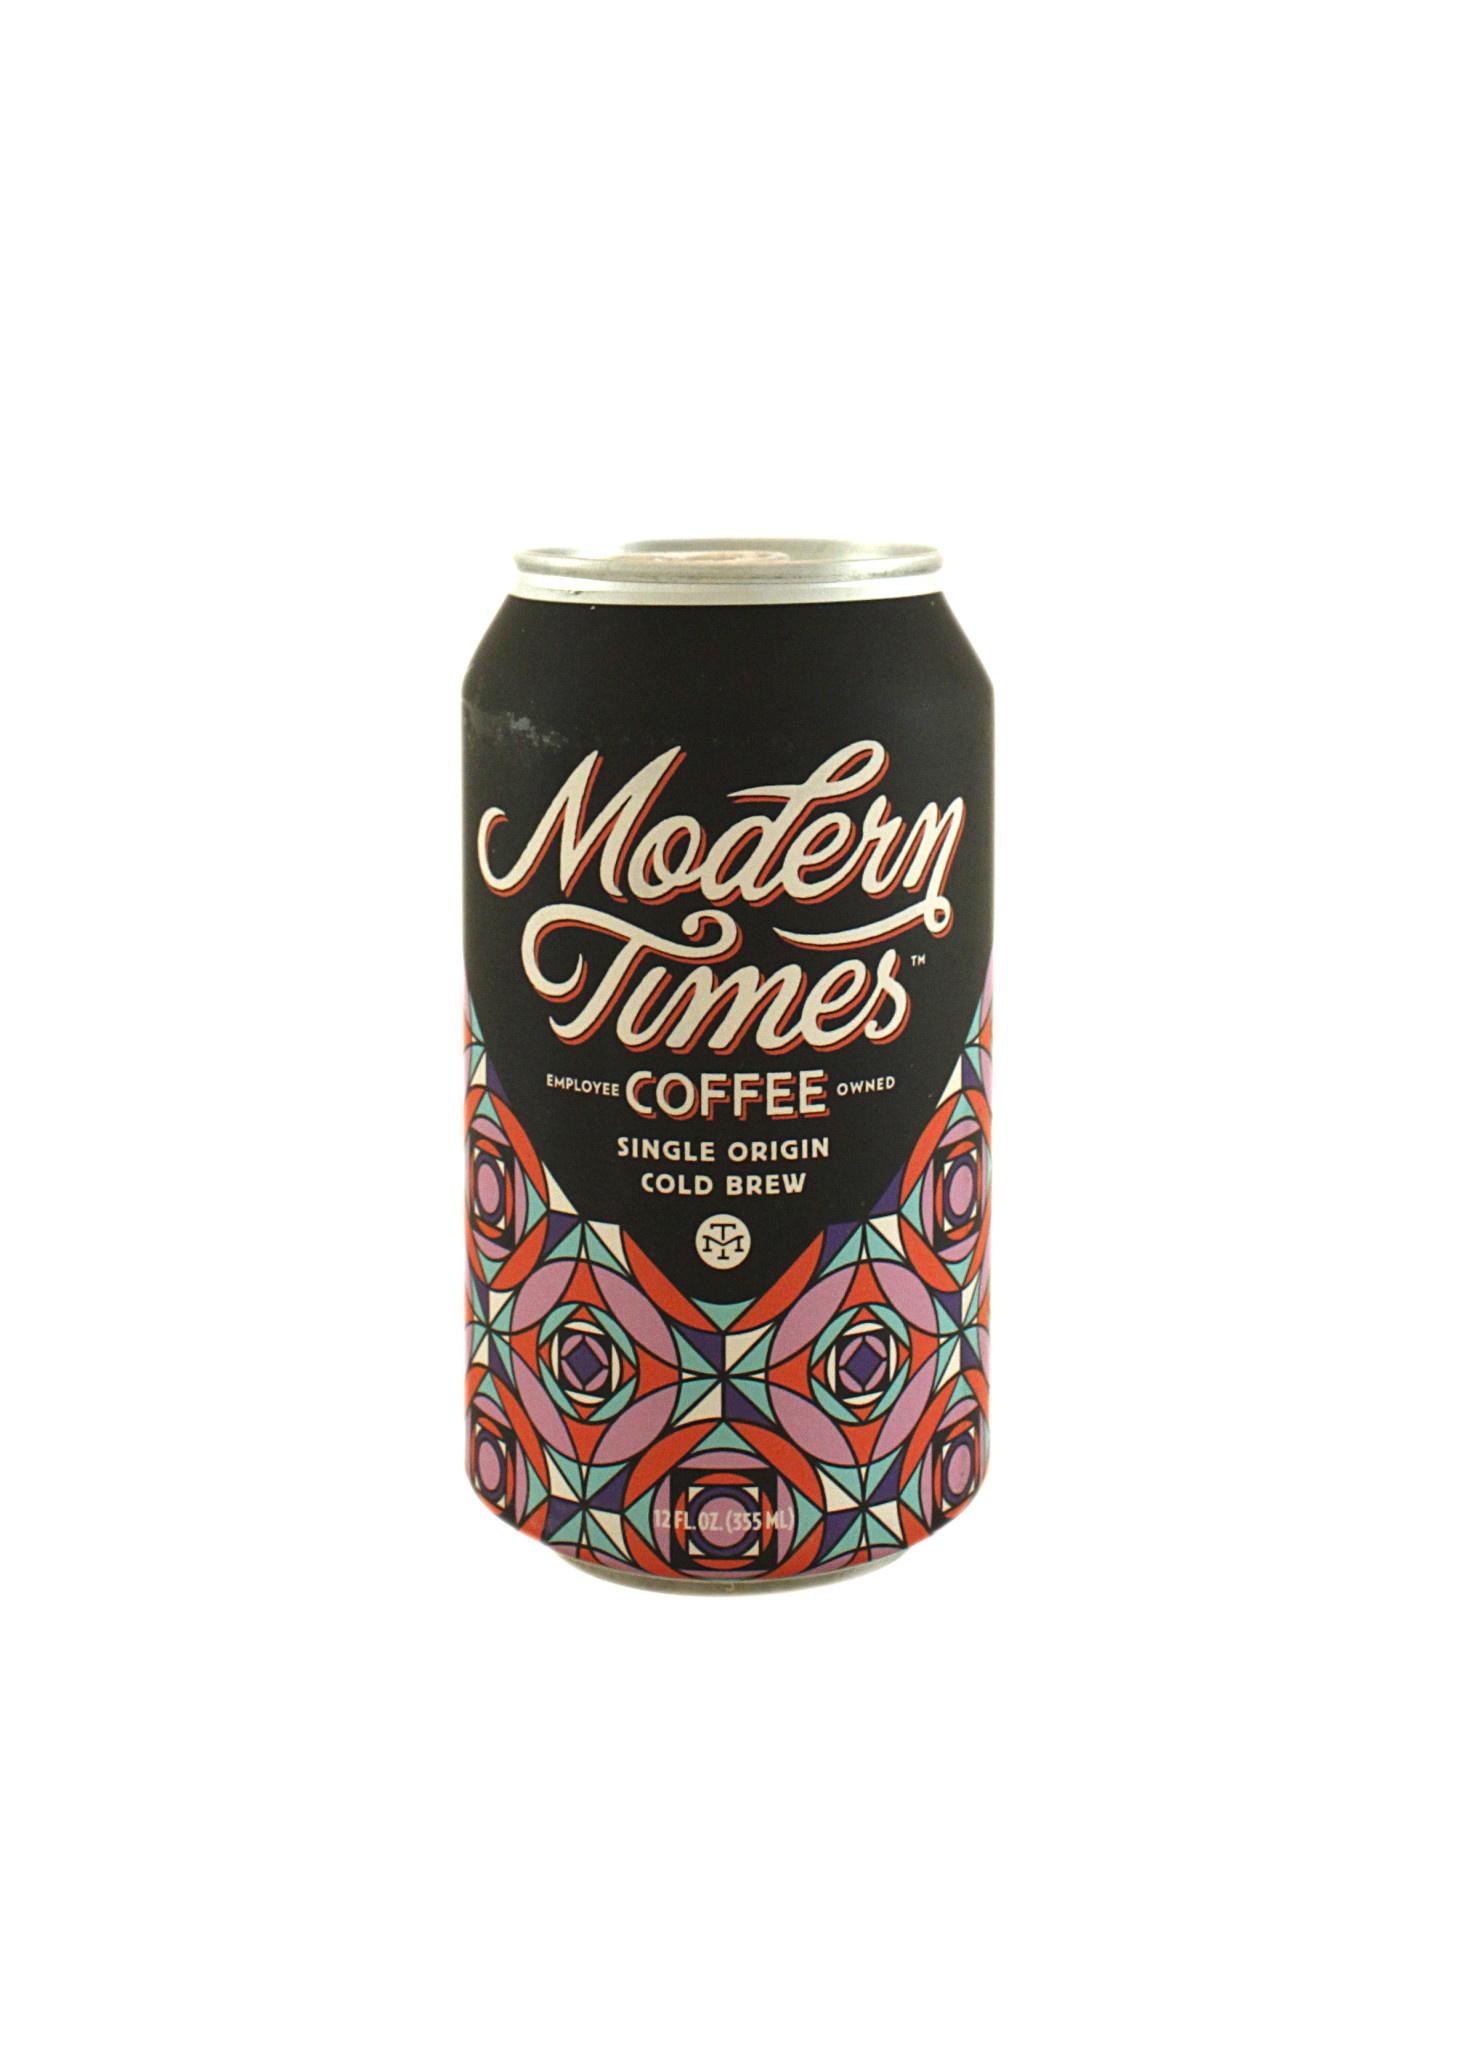 Modern Times Coffee Single Origin Cold Brew 100% Ethiopia 12oz. Can